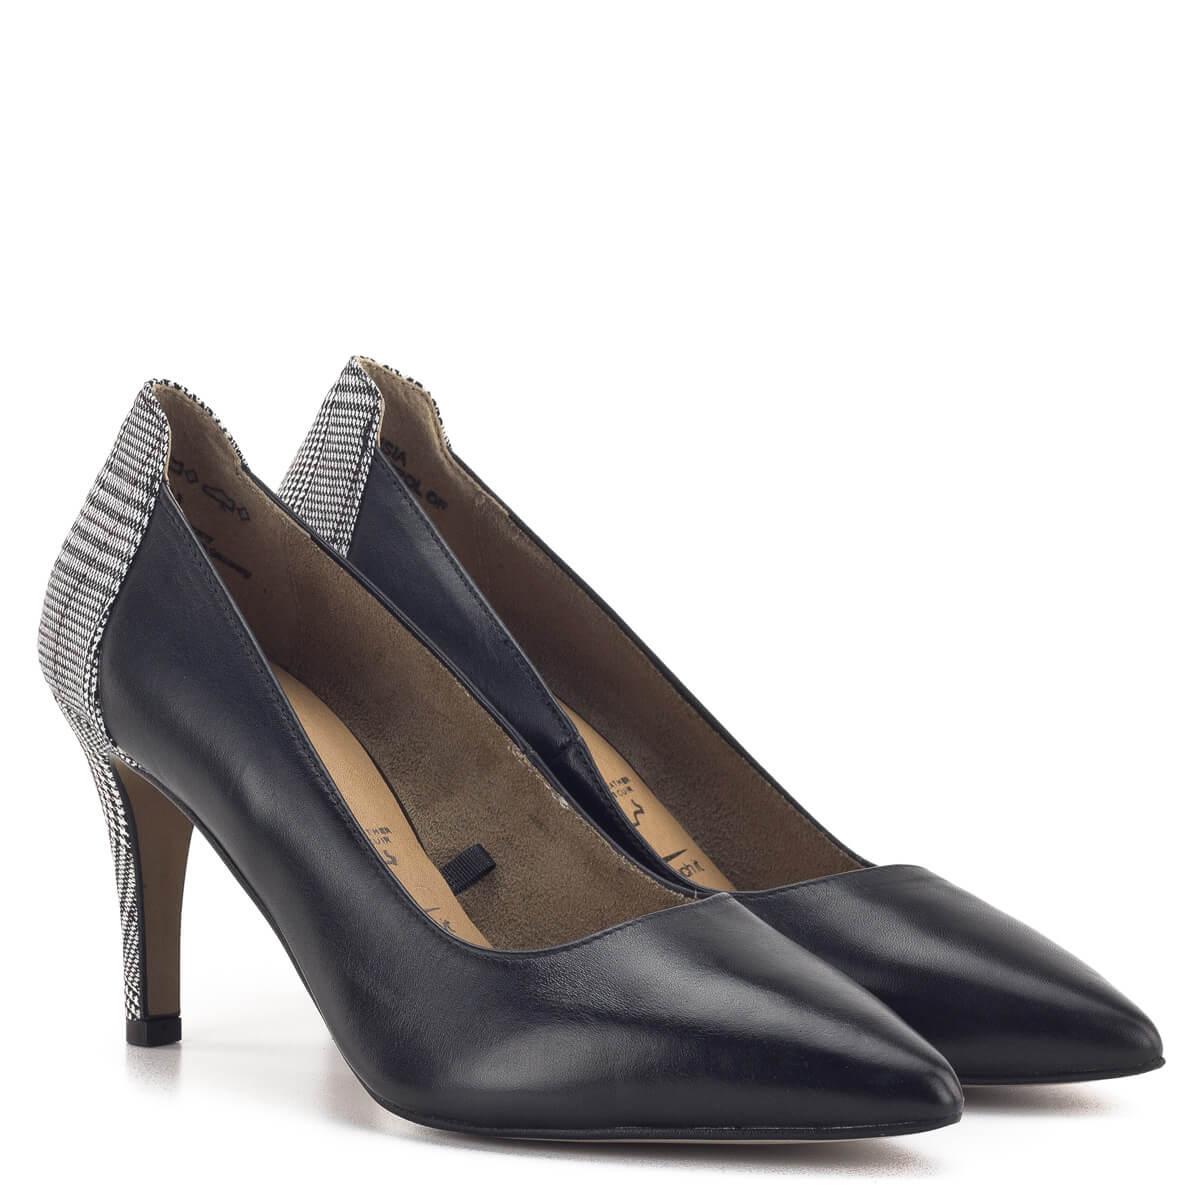 Körömcipők és magassarkú cipők – női cipők online | H&M HU